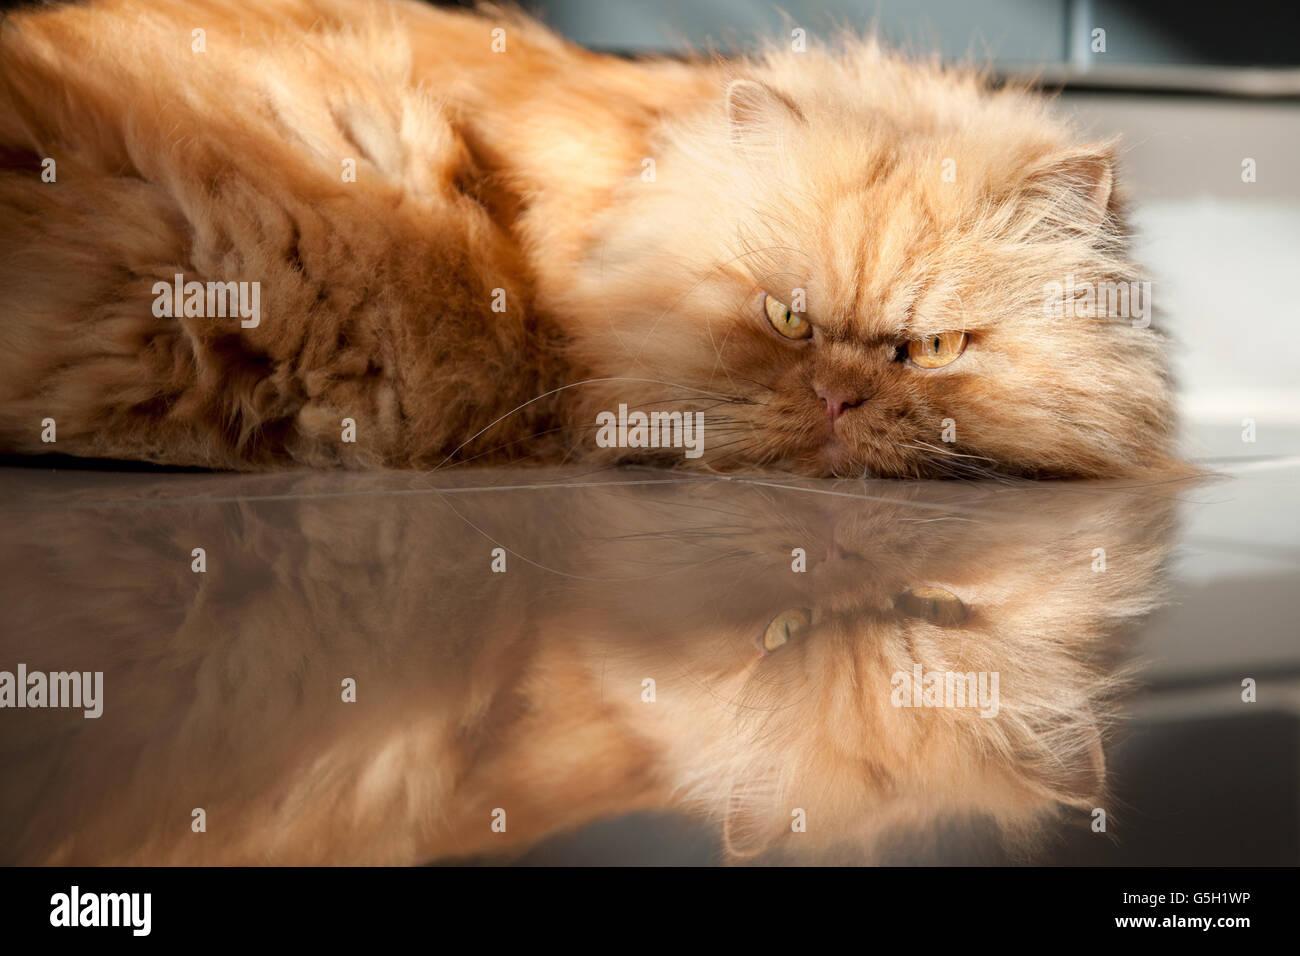 Persian cat lying on floor - Stock Image